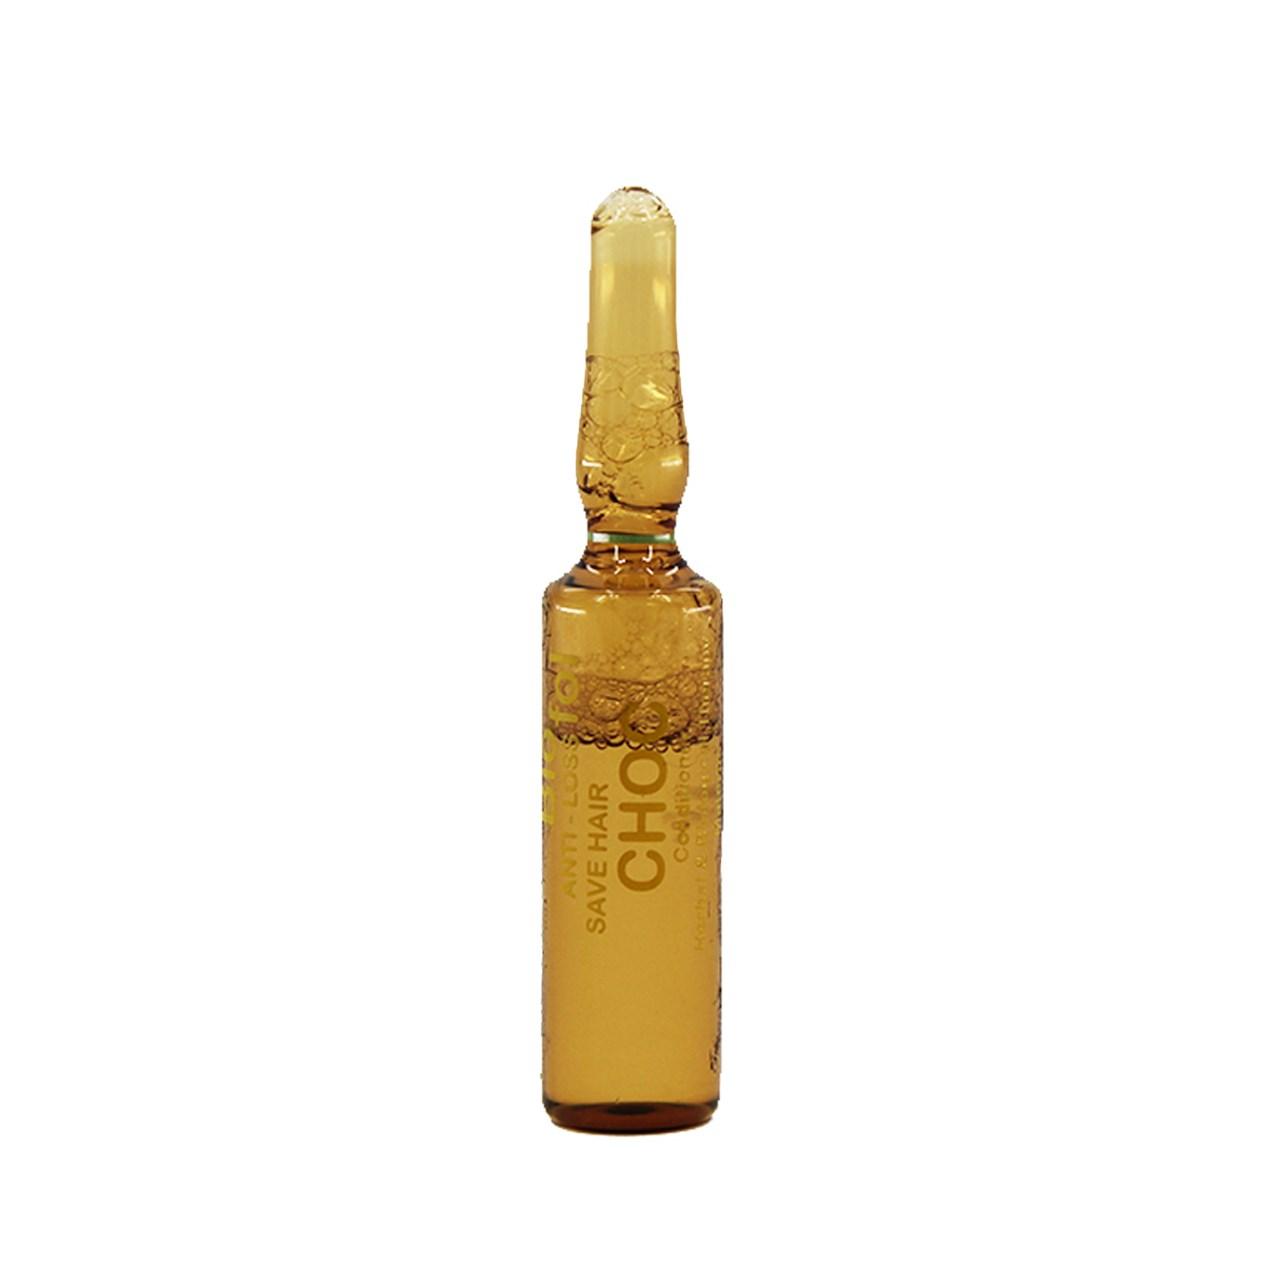 قیمت سرم مو لوسوئن مدل Choc-Biofol حجم 50 میلی لیتر بسته 10 عددی